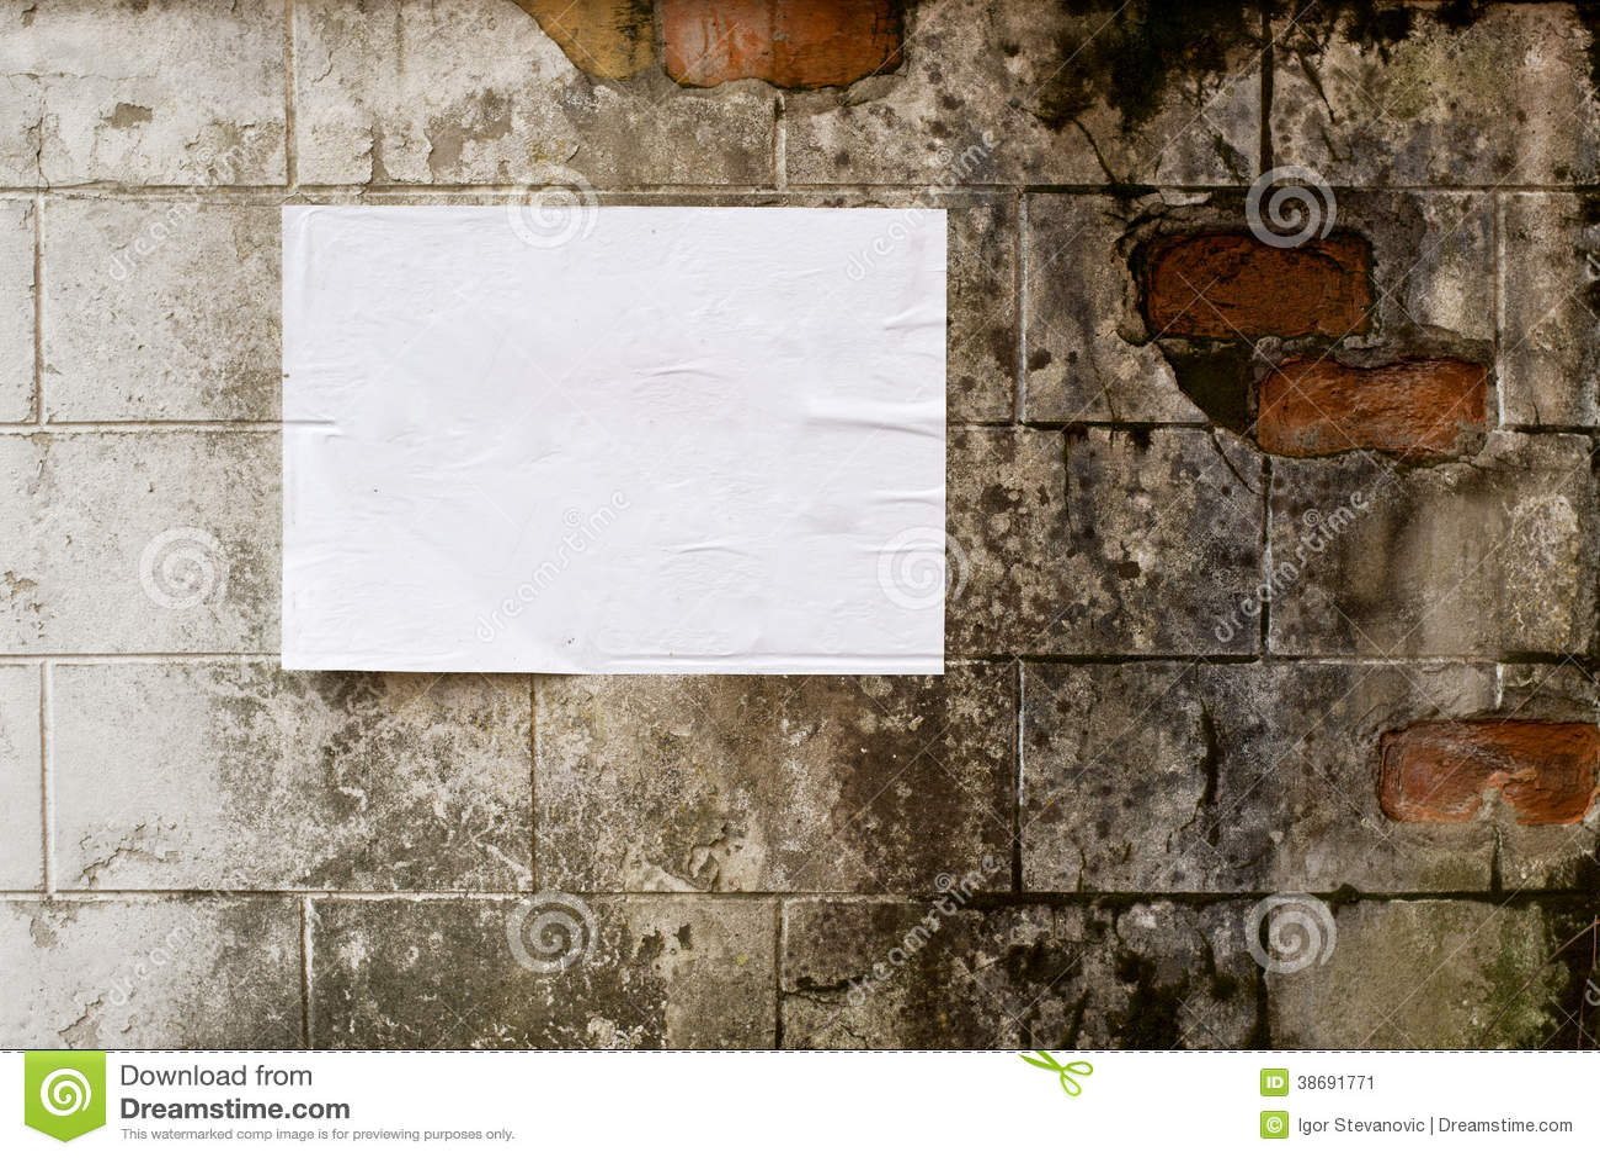 Blank White Poster On Grunge Wall Stock Image Image